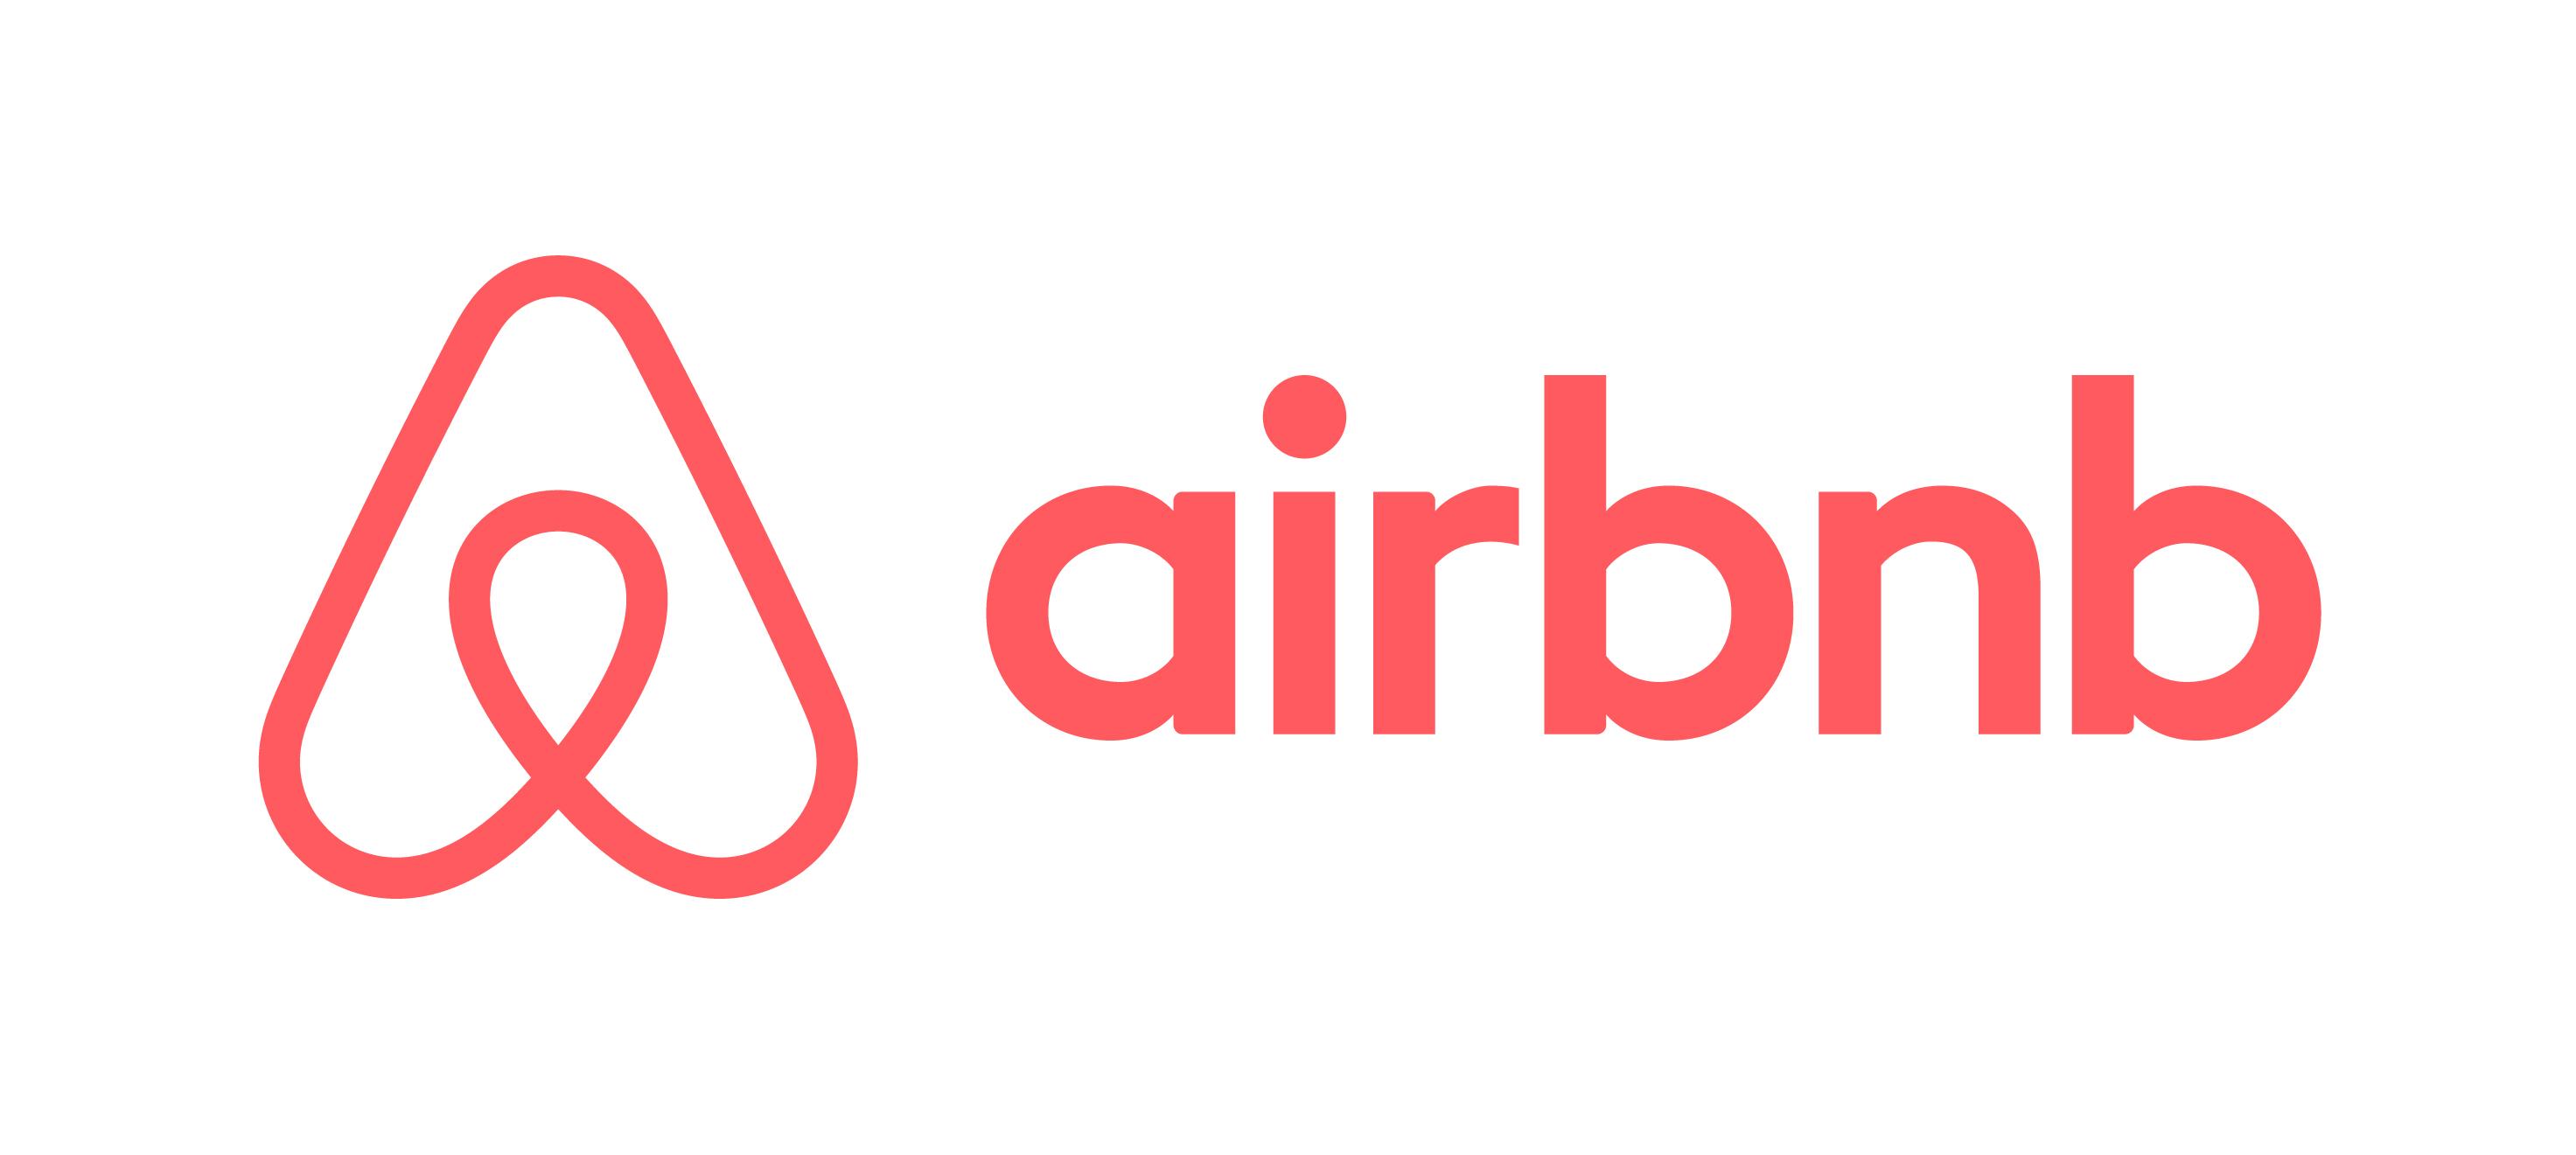 Carcassonne, ville chouchou d'Airbnb